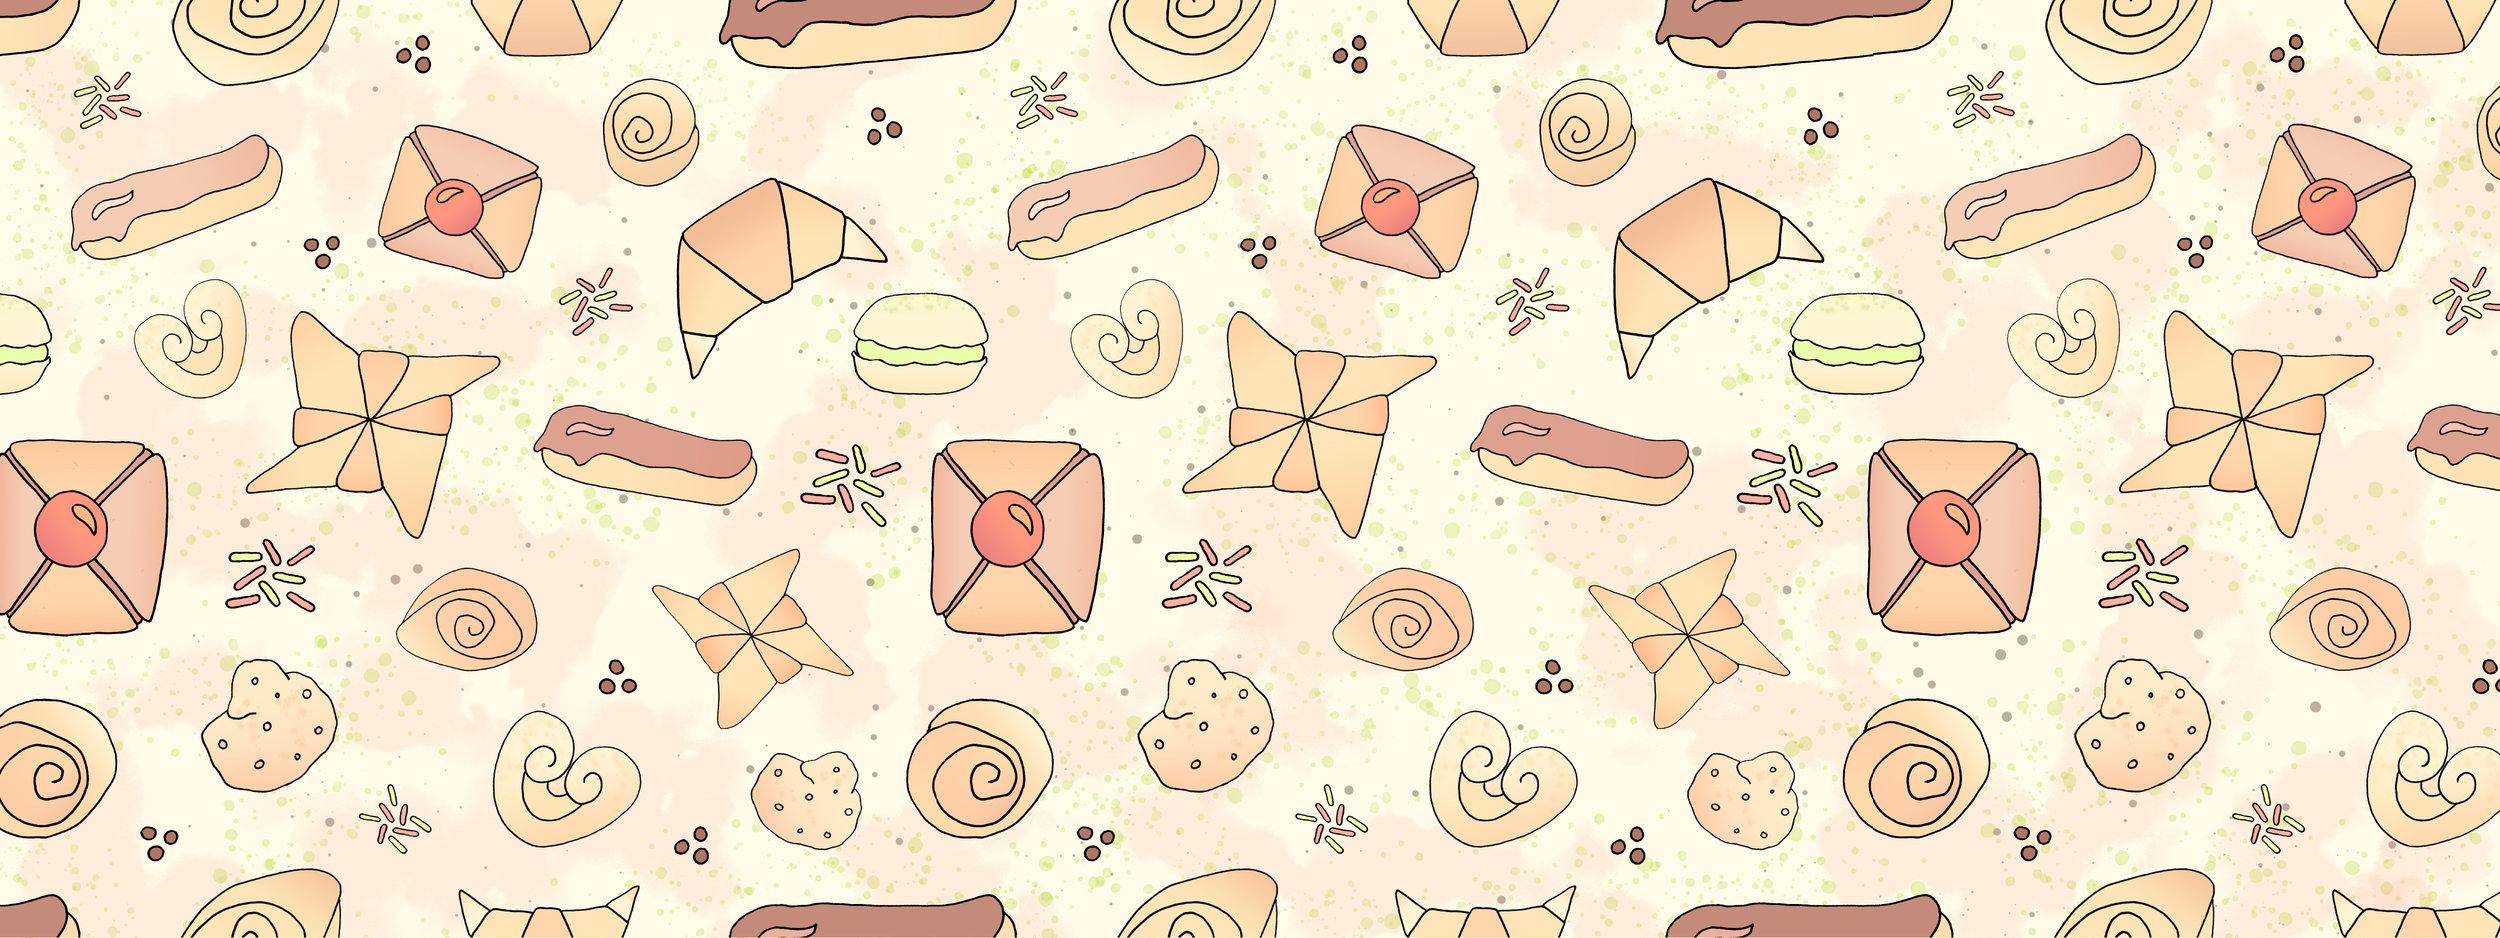 food-packaging-illustration.jpg